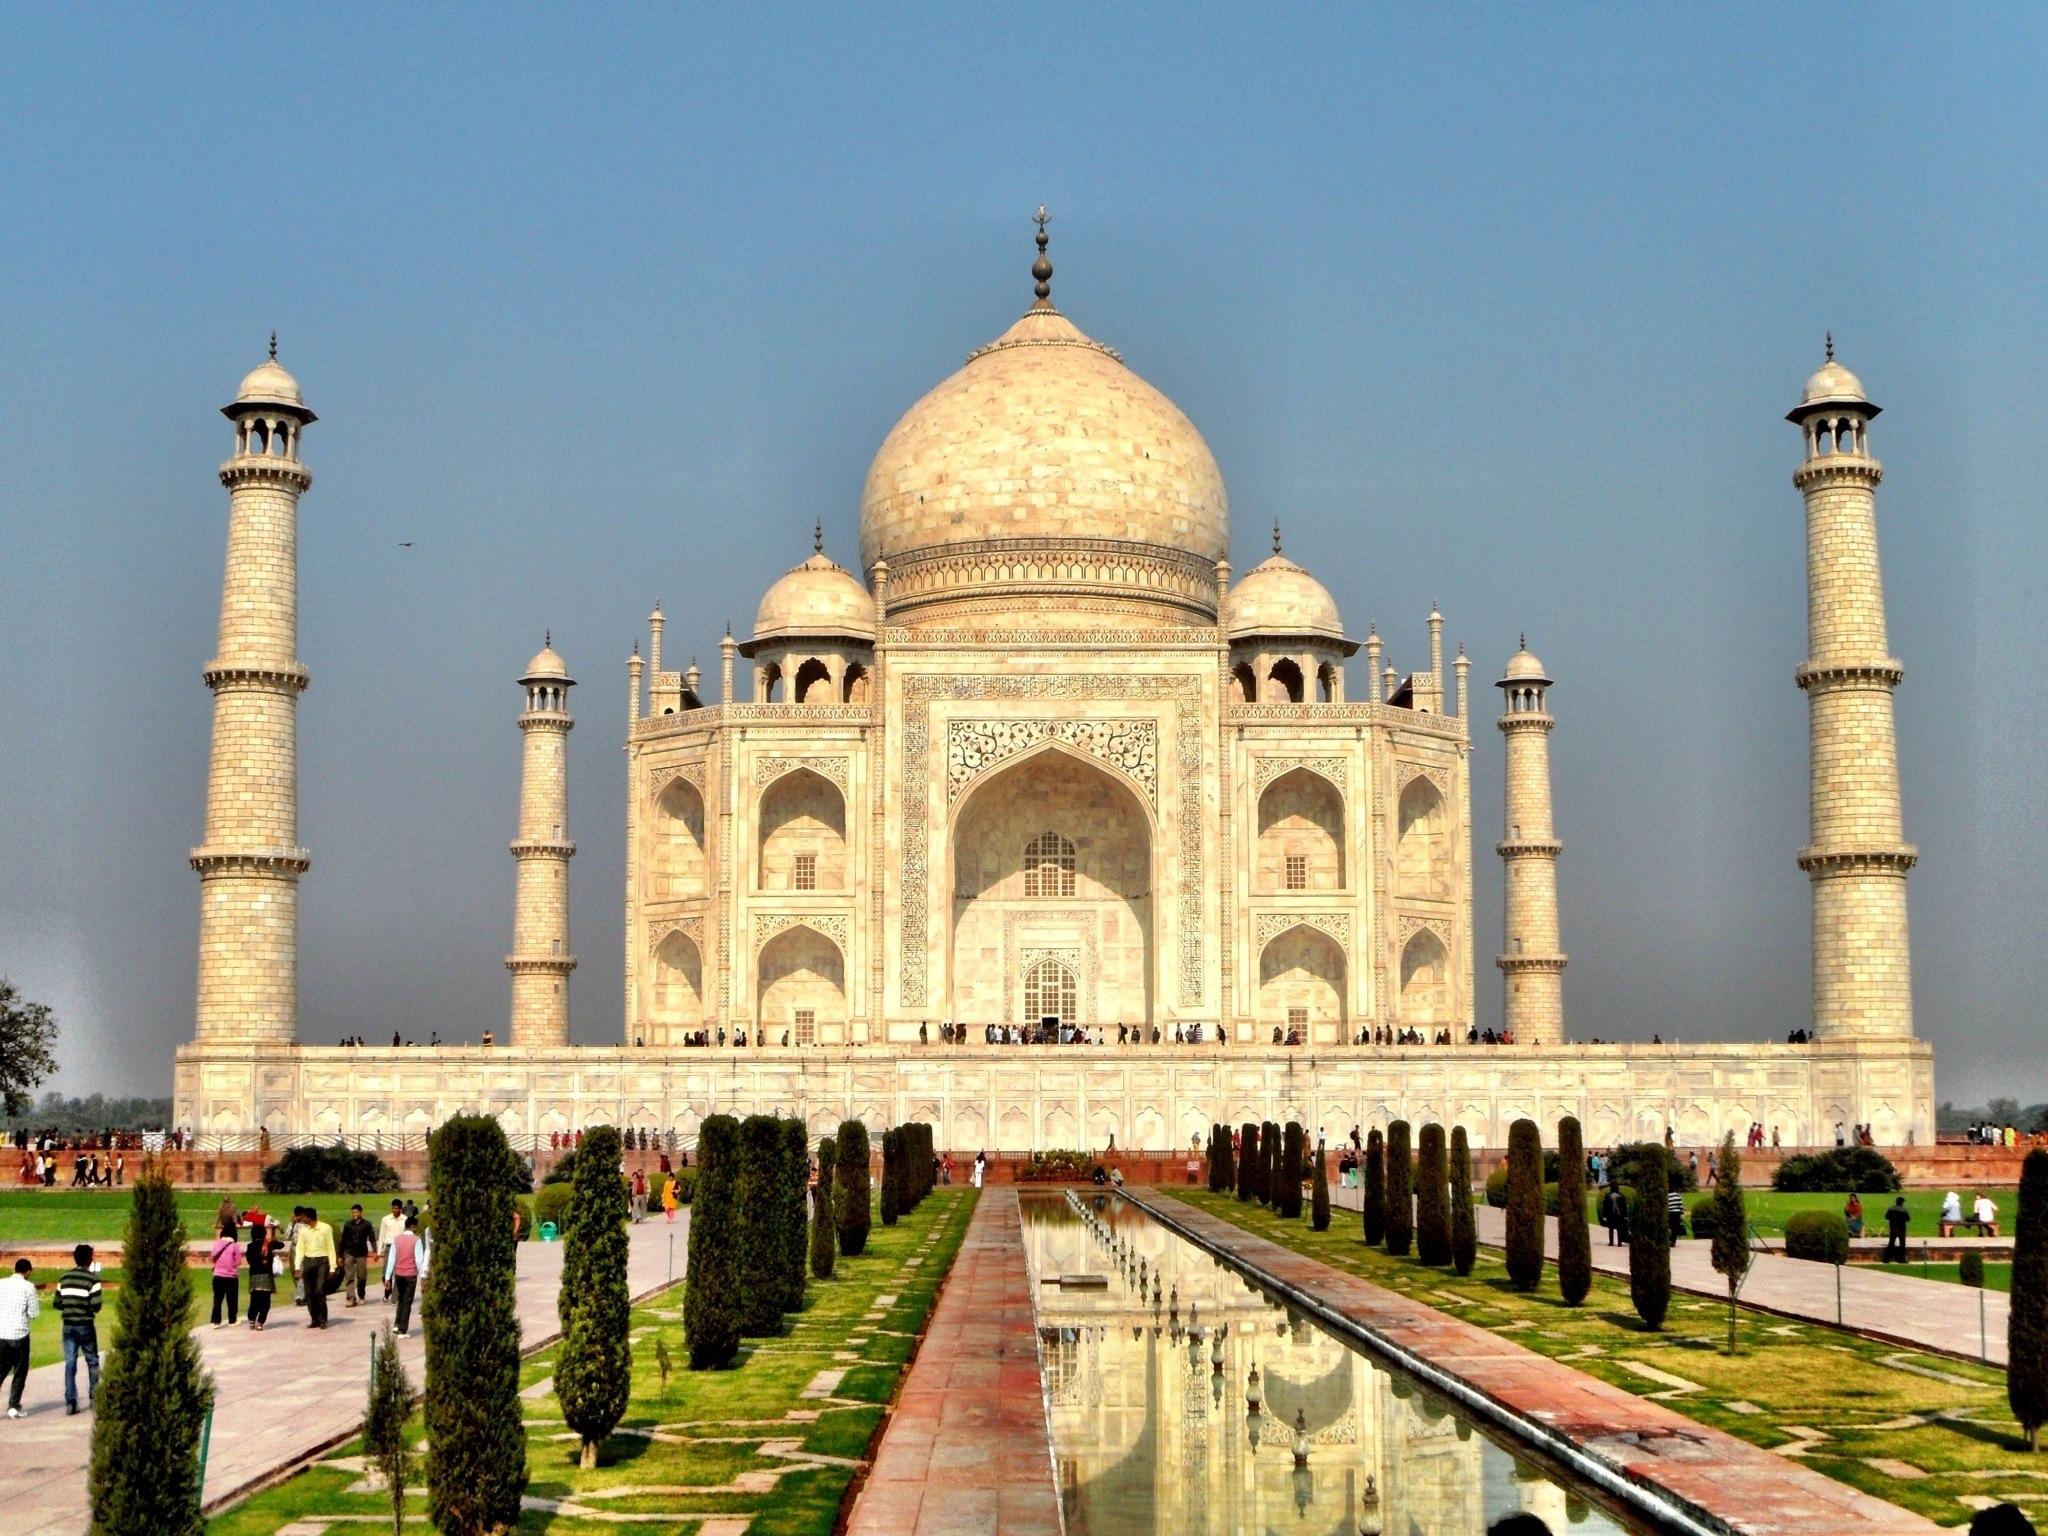 Ewige Schönheit! das Taj Mahal